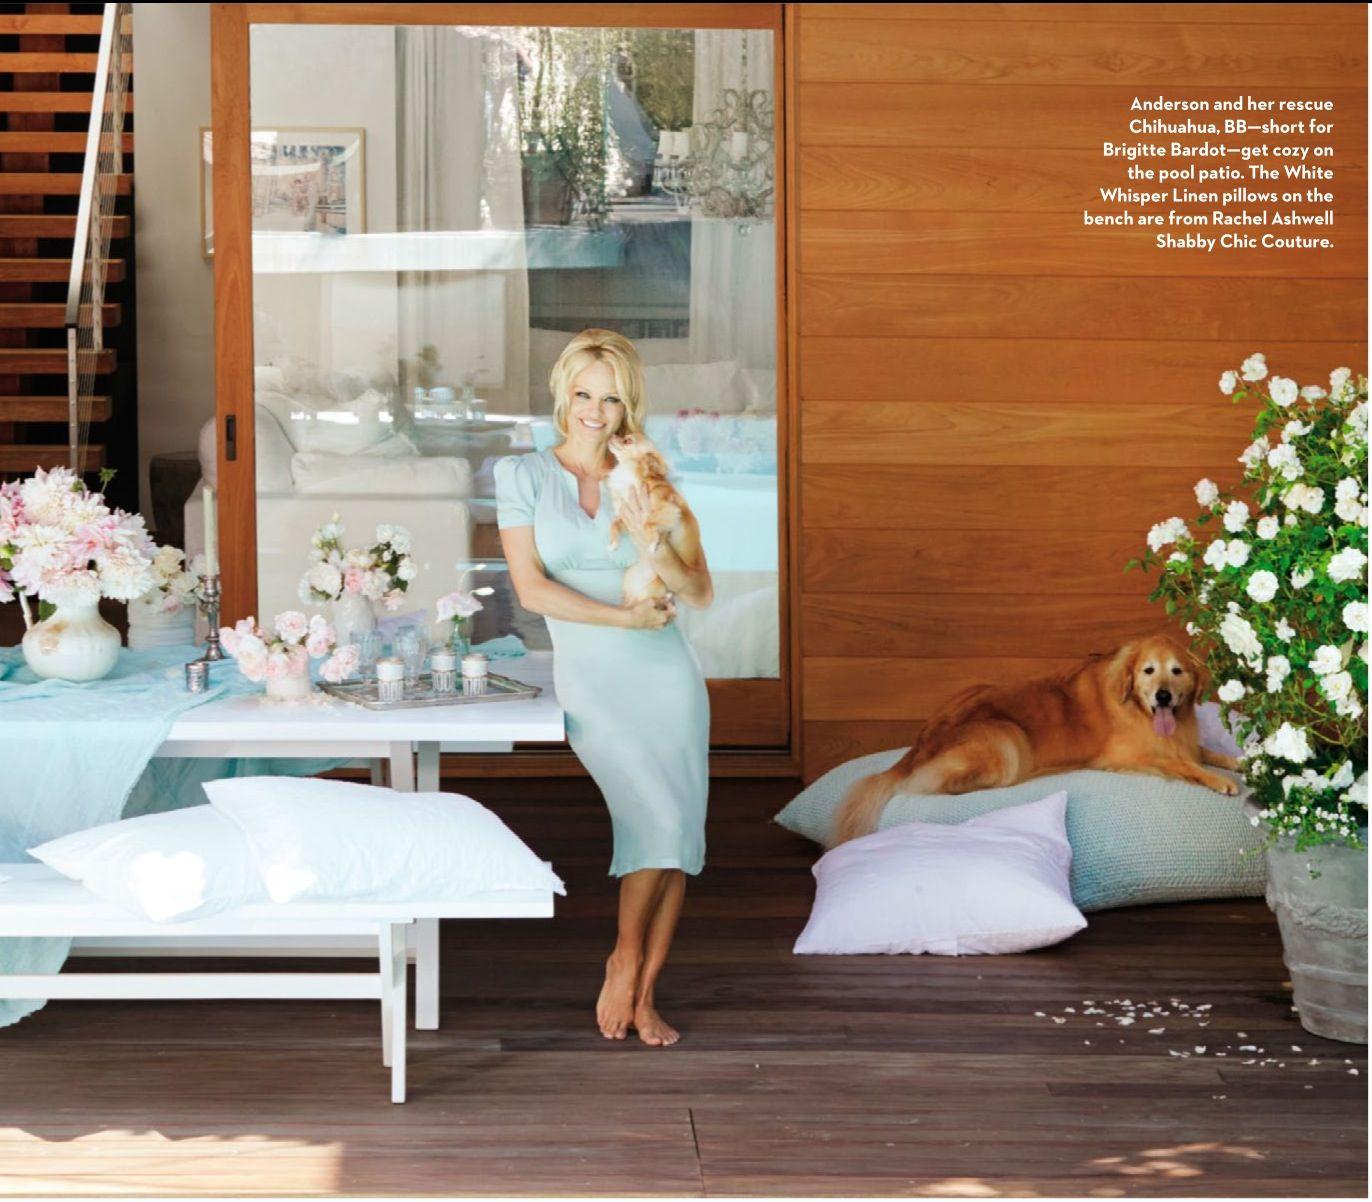 Pamela anderson celebrity homes pinterest coastal for Rachel ashwell house